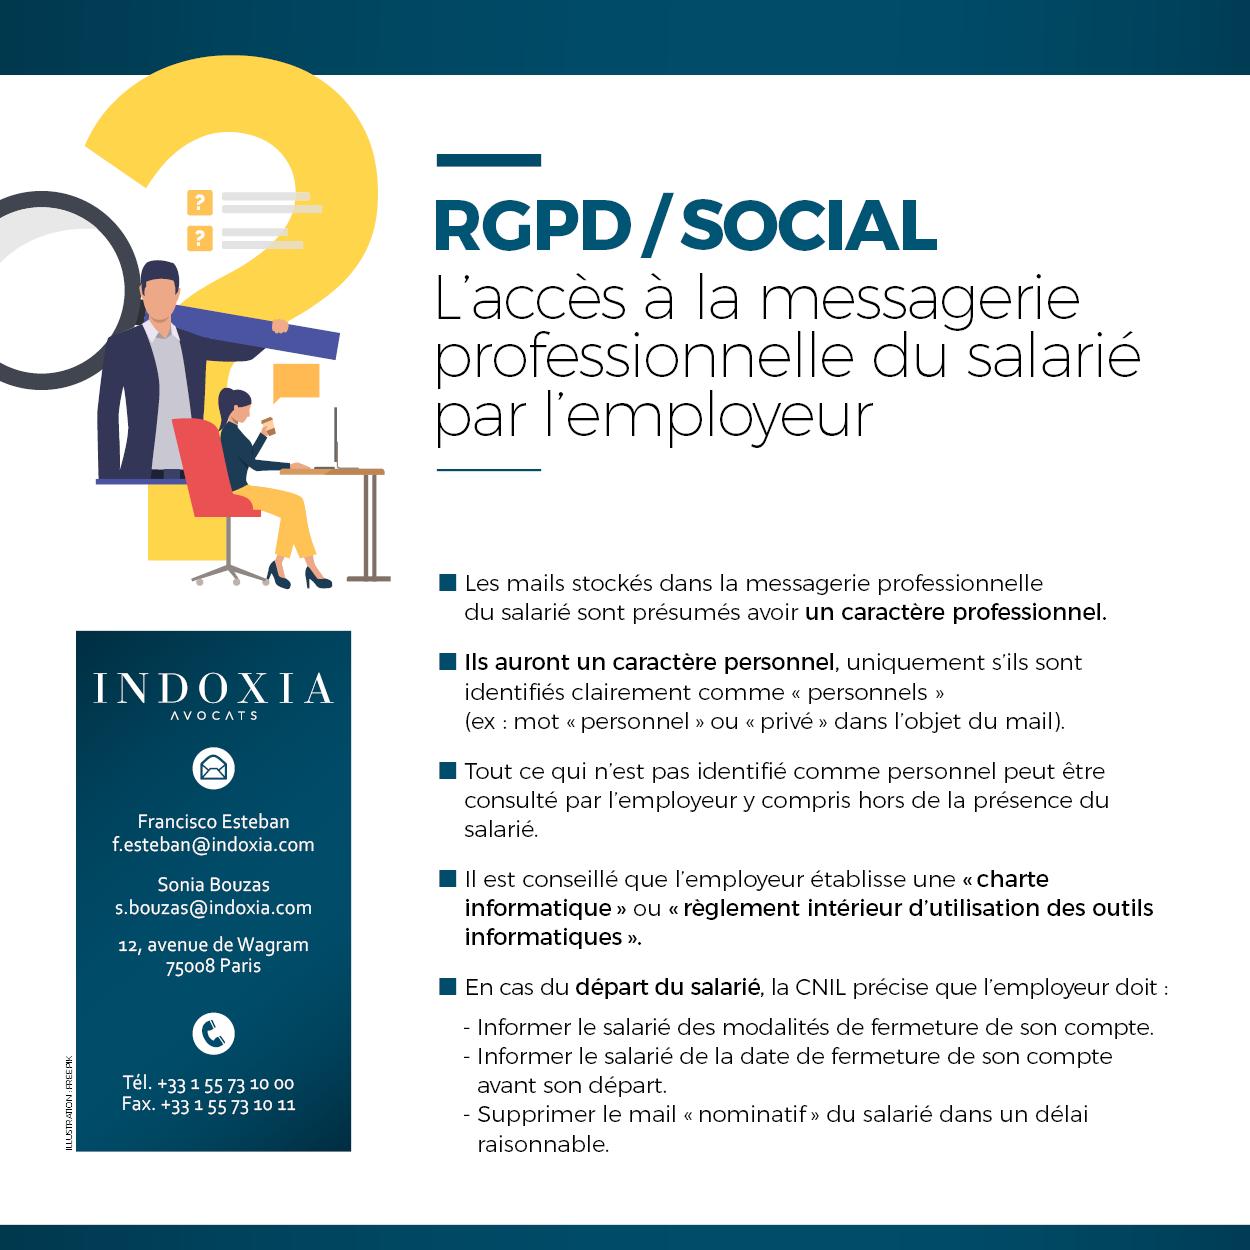 rgpd-social-ok-5fad64f65f377.png